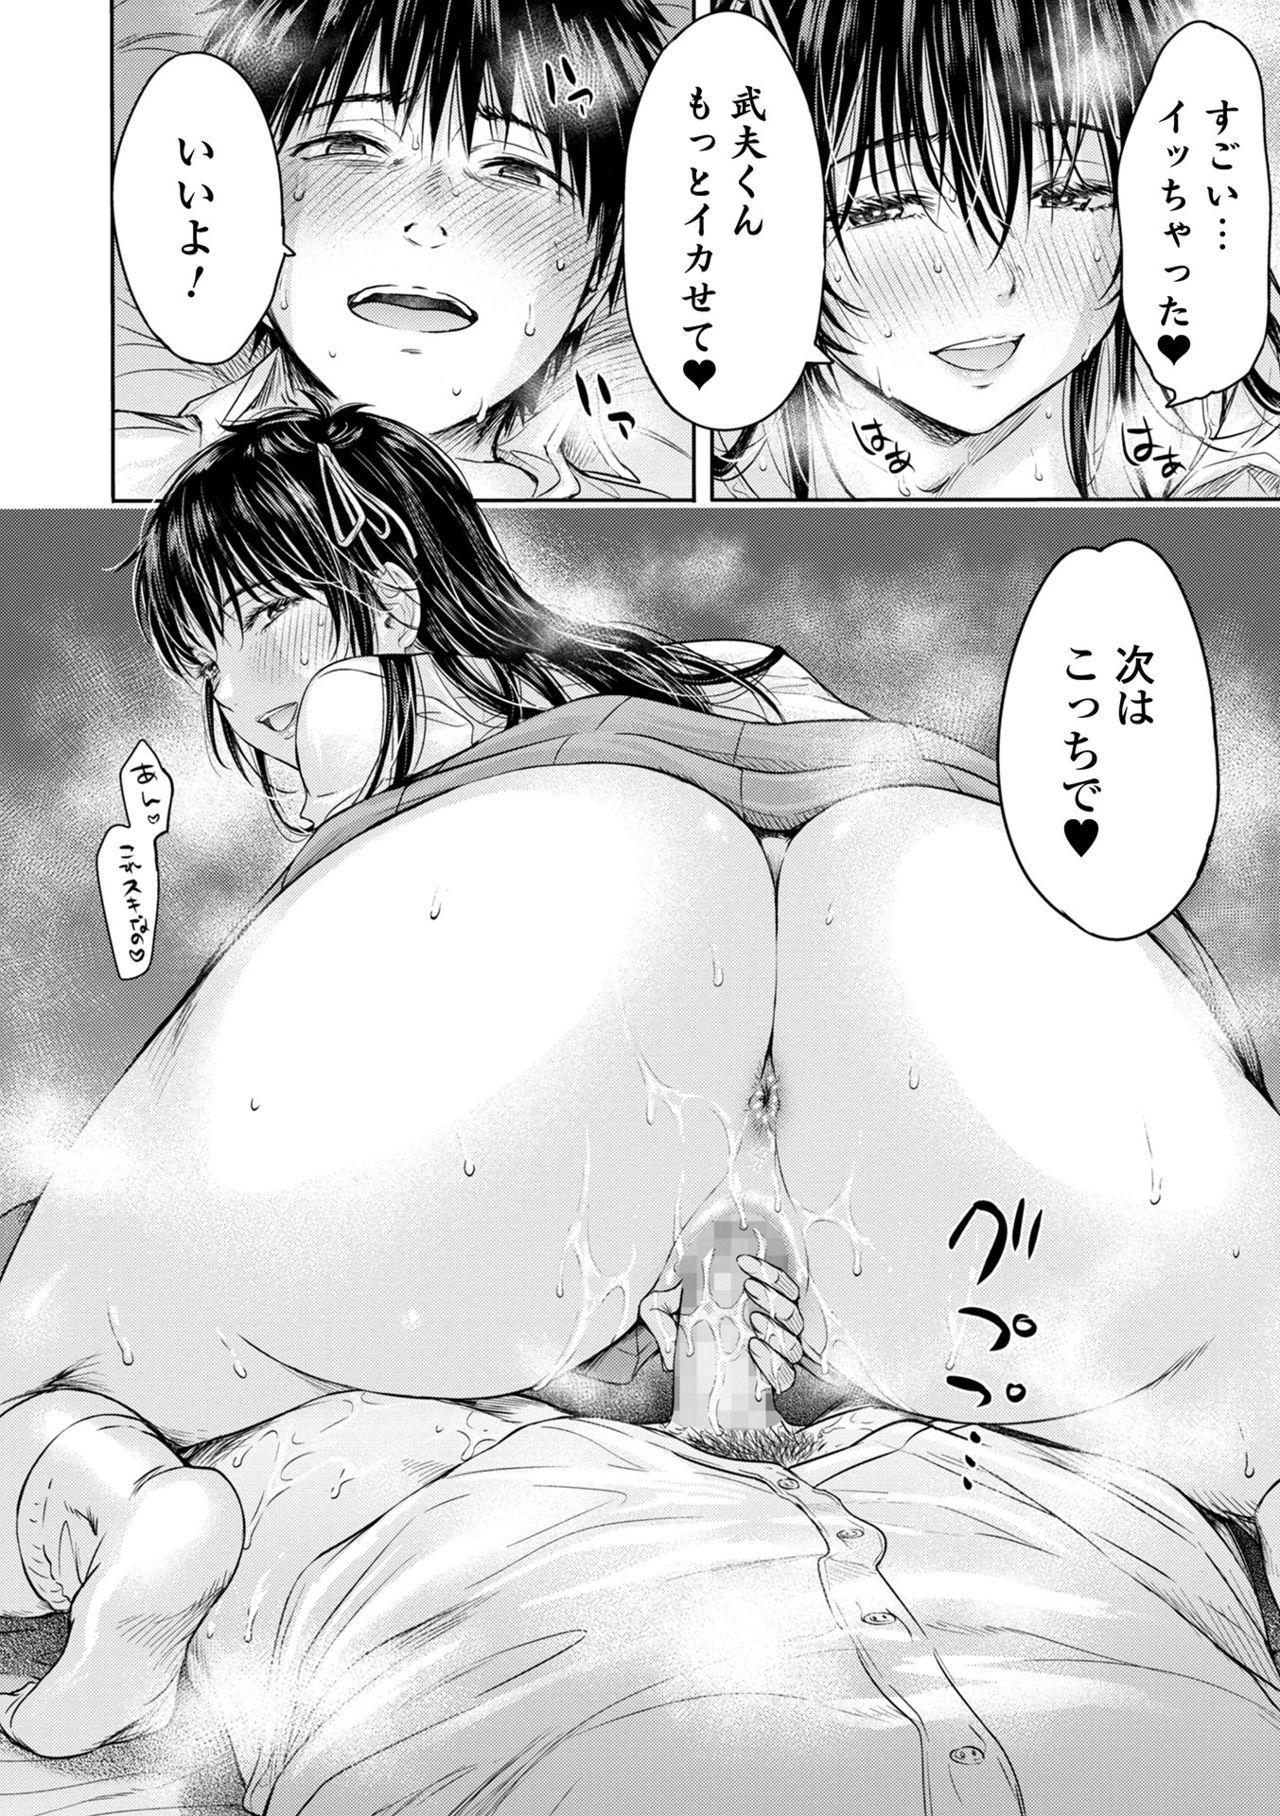 COMIC Shigekiteki SQUIRT!! Vol. 25 33